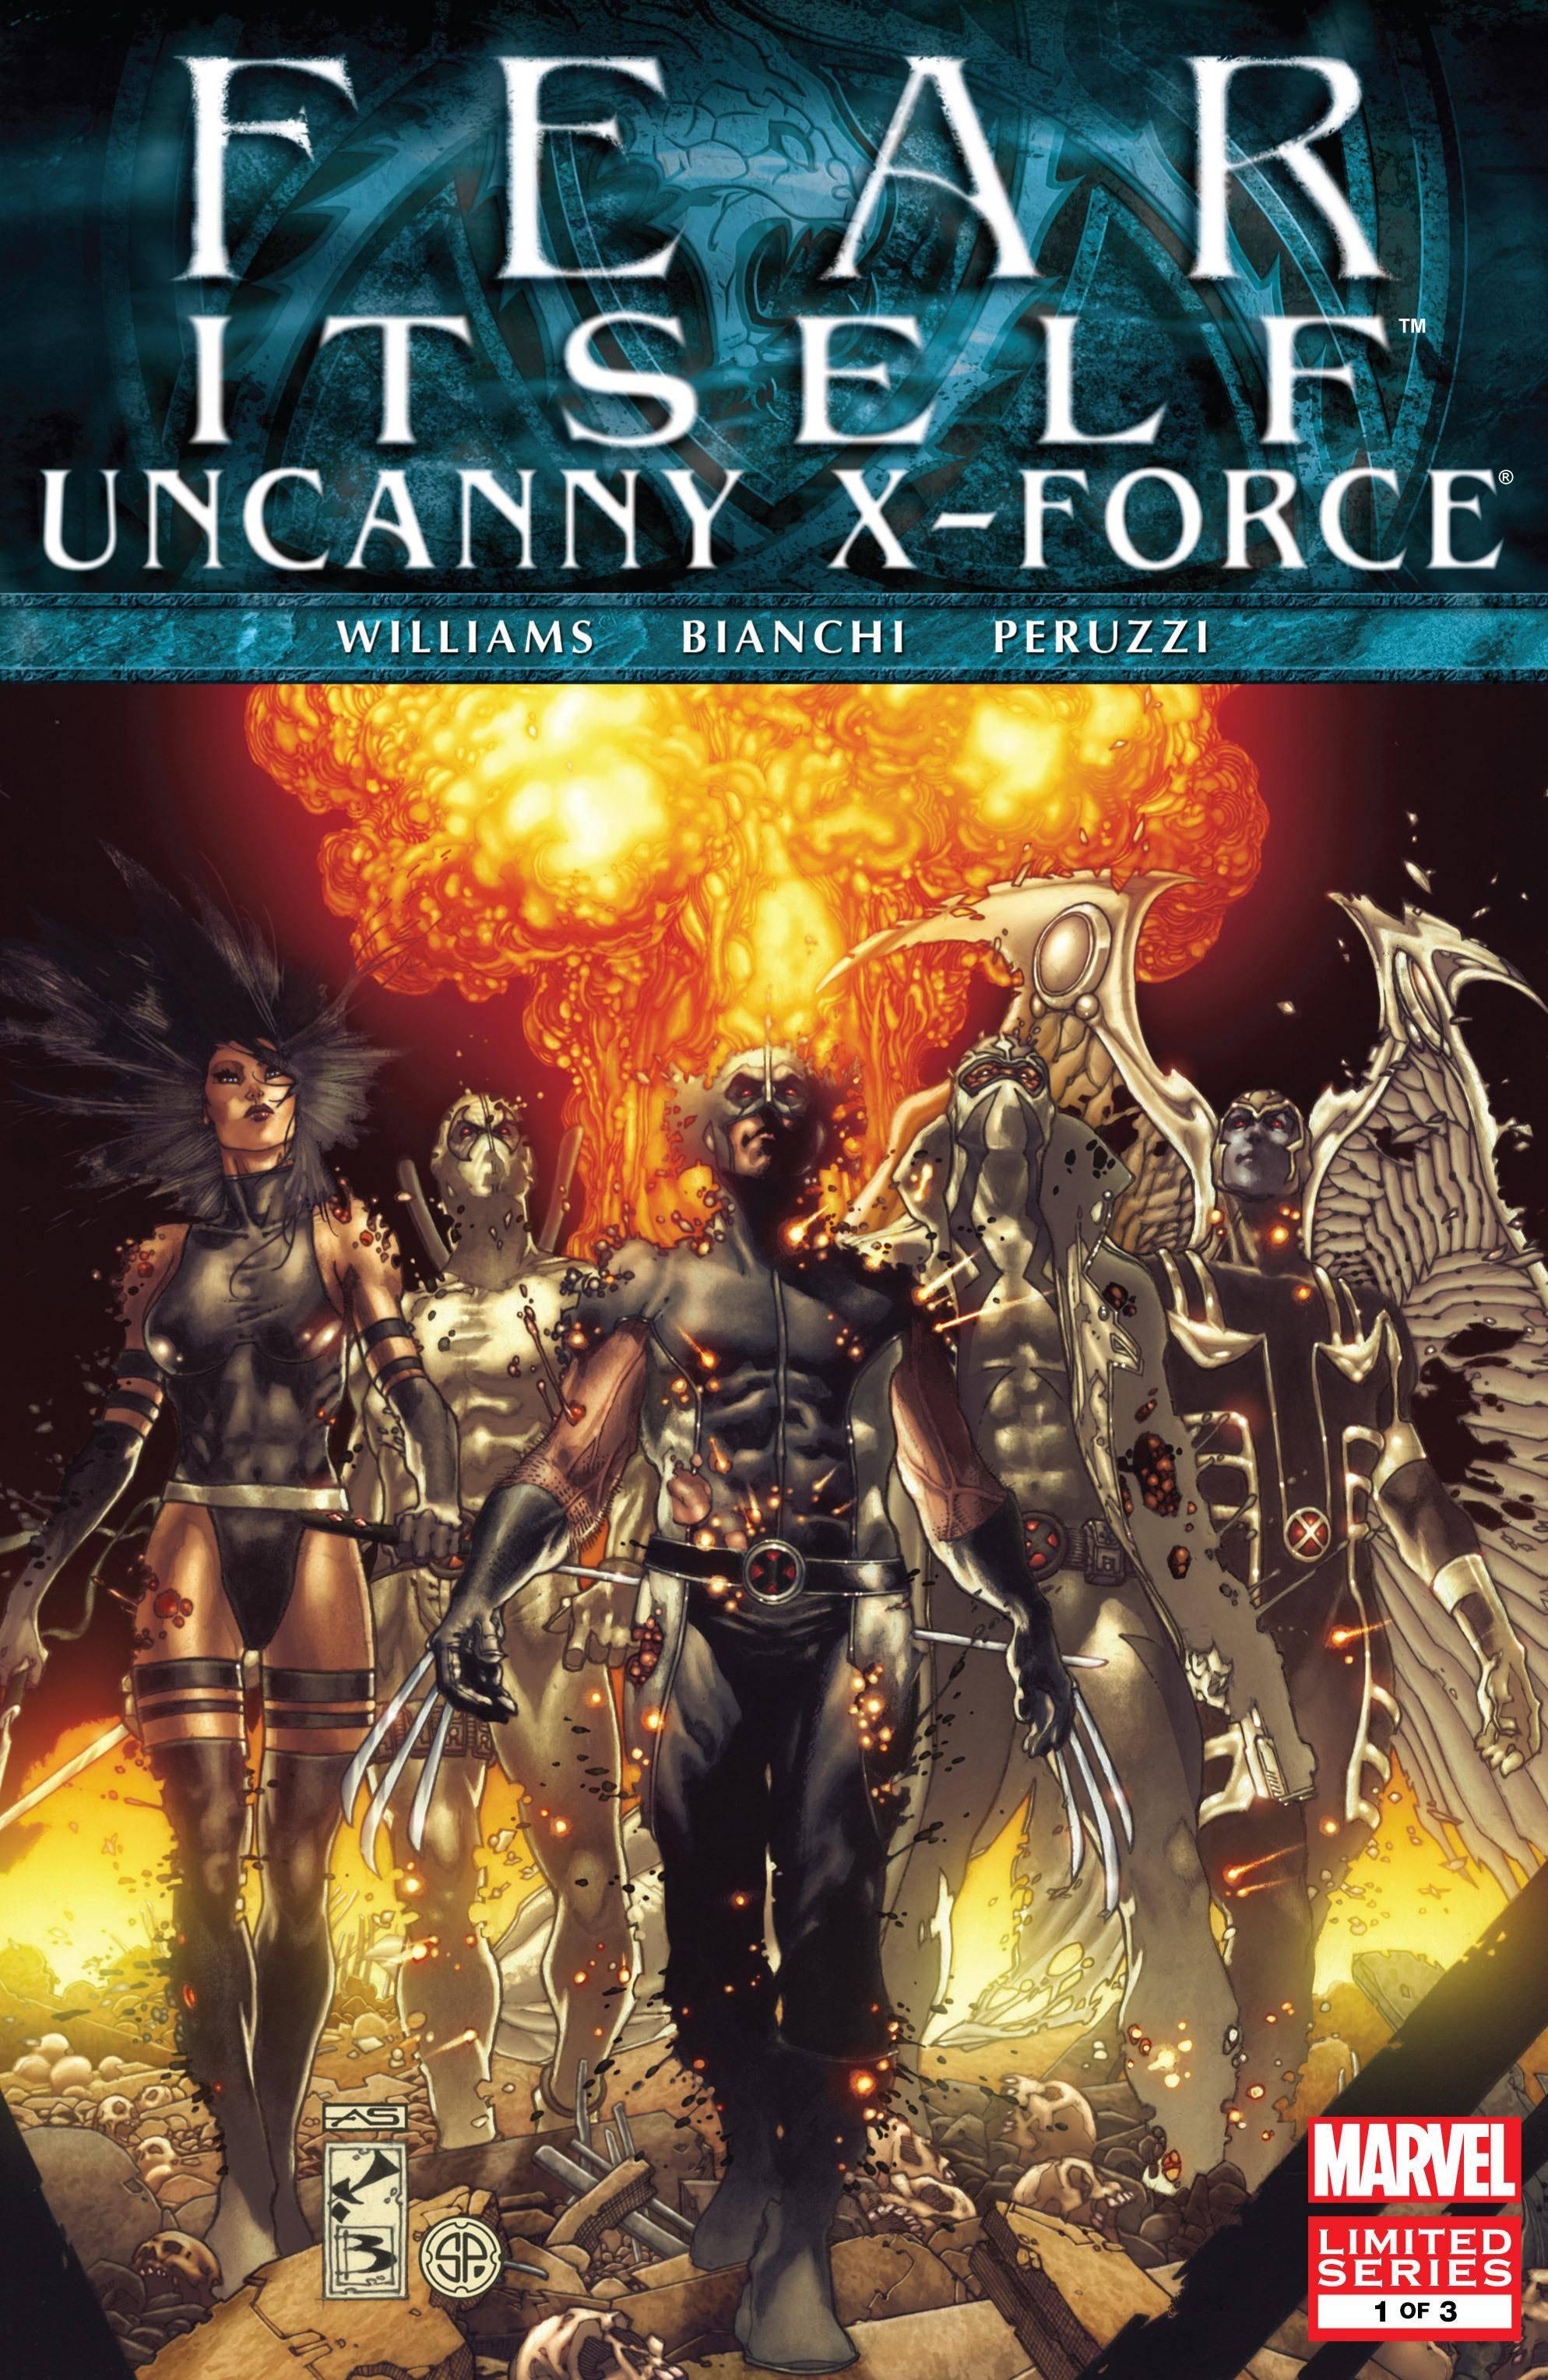 New Releases 2015 3 15 Fear Itself Uncanny X Force 001 2011 digital hd Kleio Empire cbz